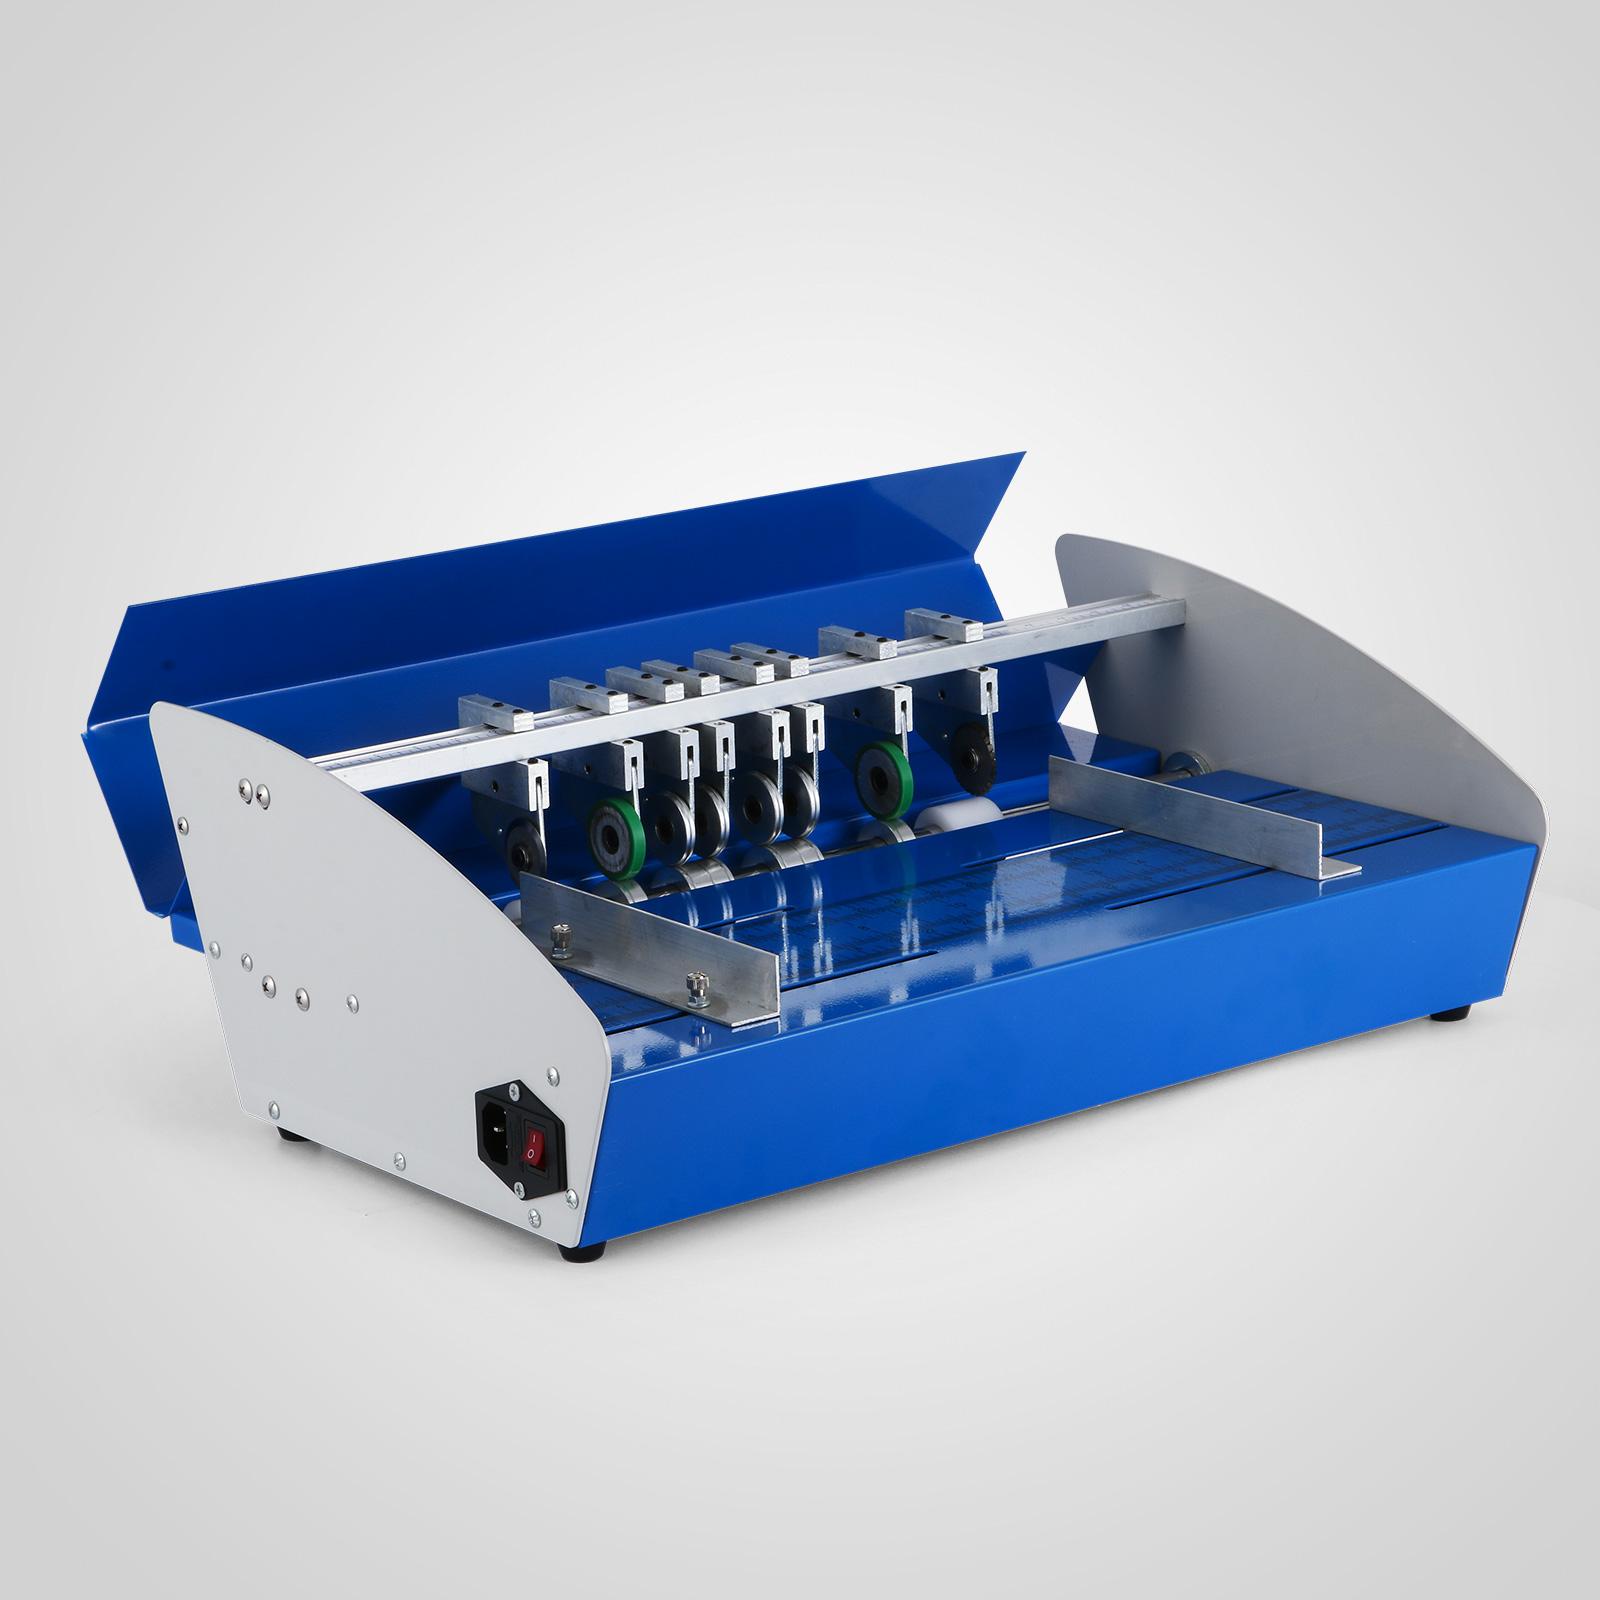 Cordonatrice-Perforatrice-Max-350-520mm-Profondita-Regolabile-Elettrica-Manuale miniatura 27